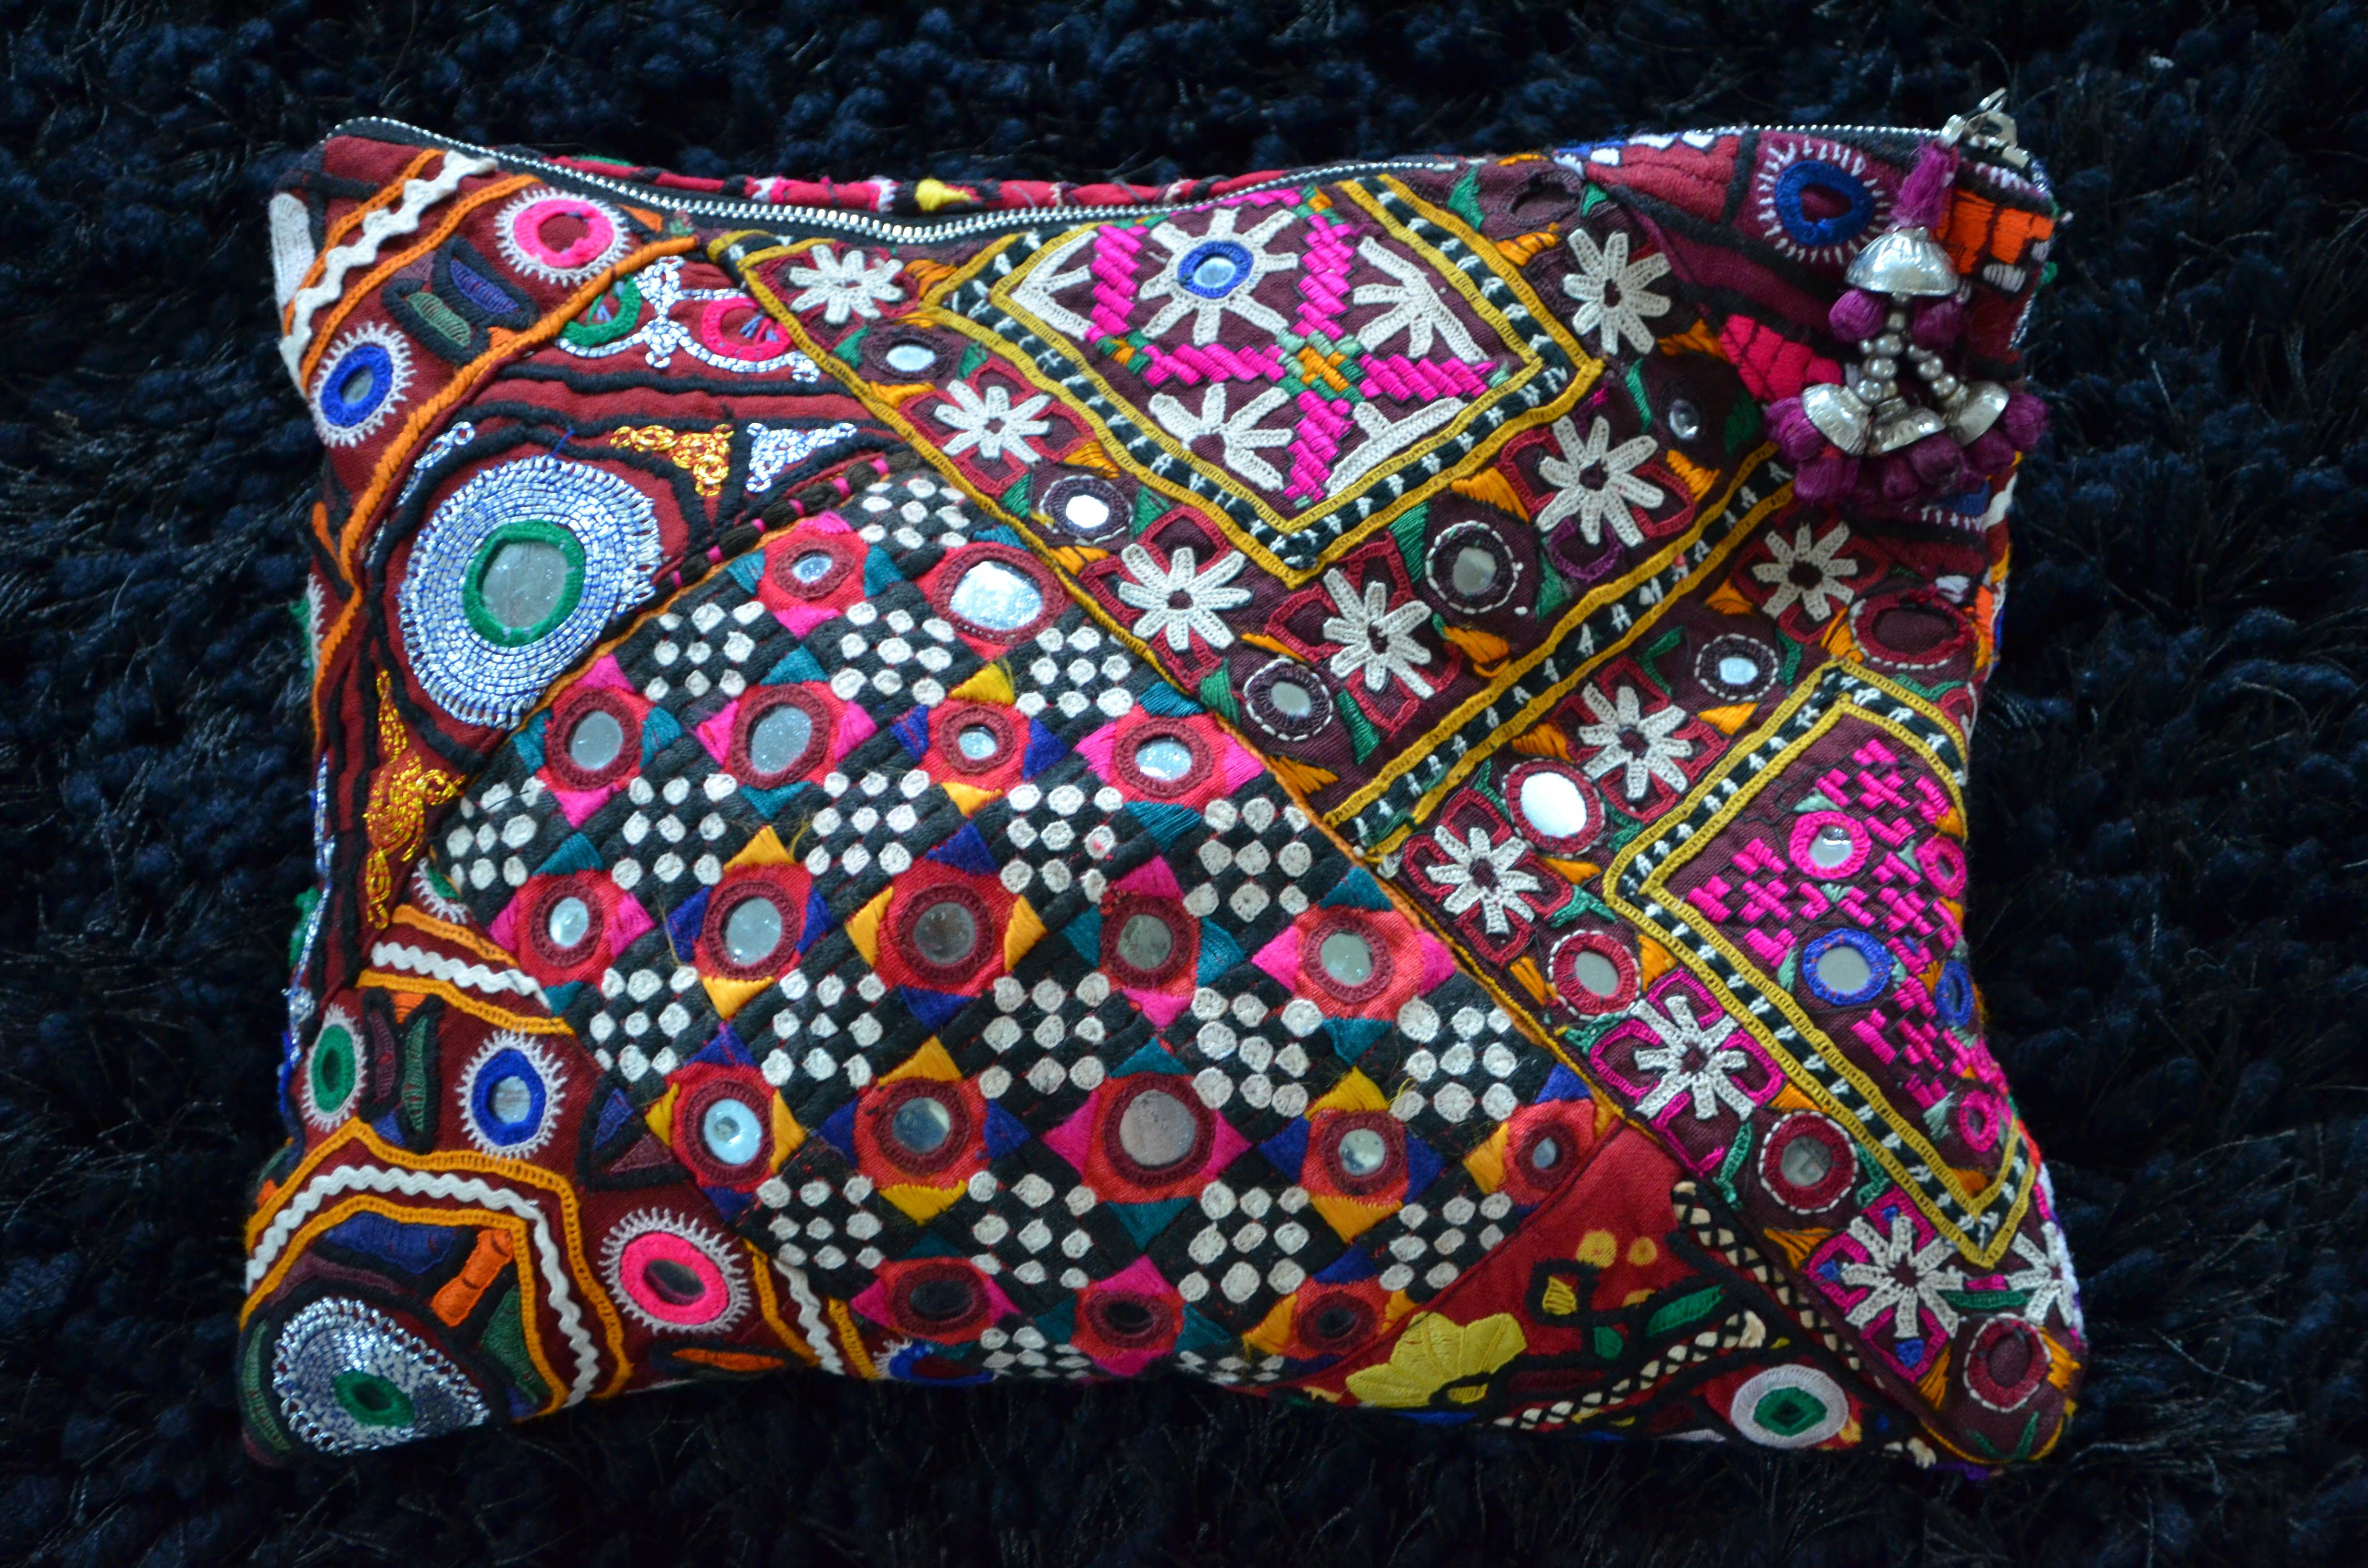 My Simone Camille make up bag